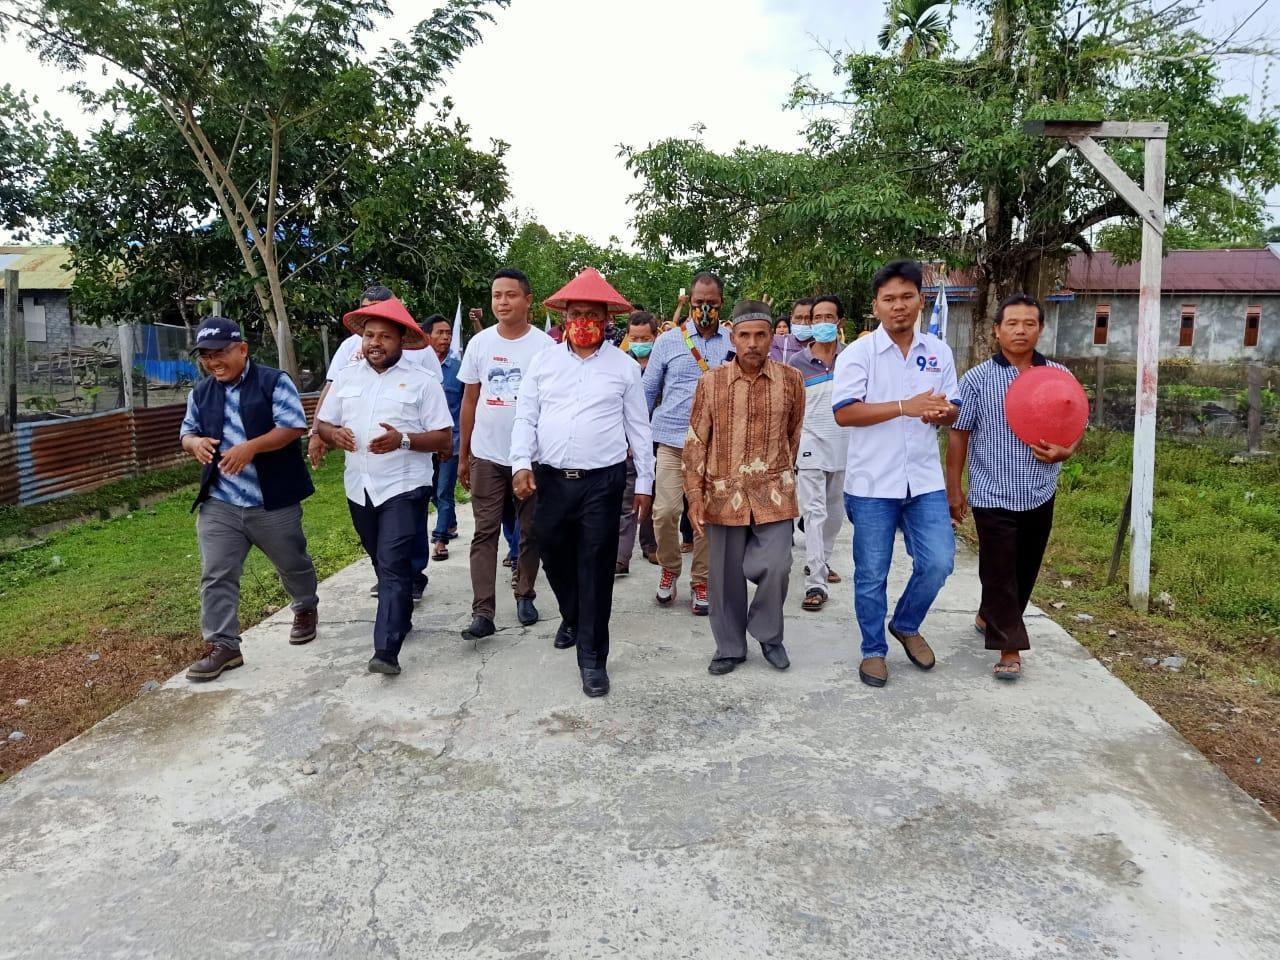 Keluh Jalan Rusak Sejak Tahun 1986, Warga Kampung Wariori Percaya Hermus-Edi Pimpin Manowari Pasti Peduli 10 IMG 20201127 WA0023